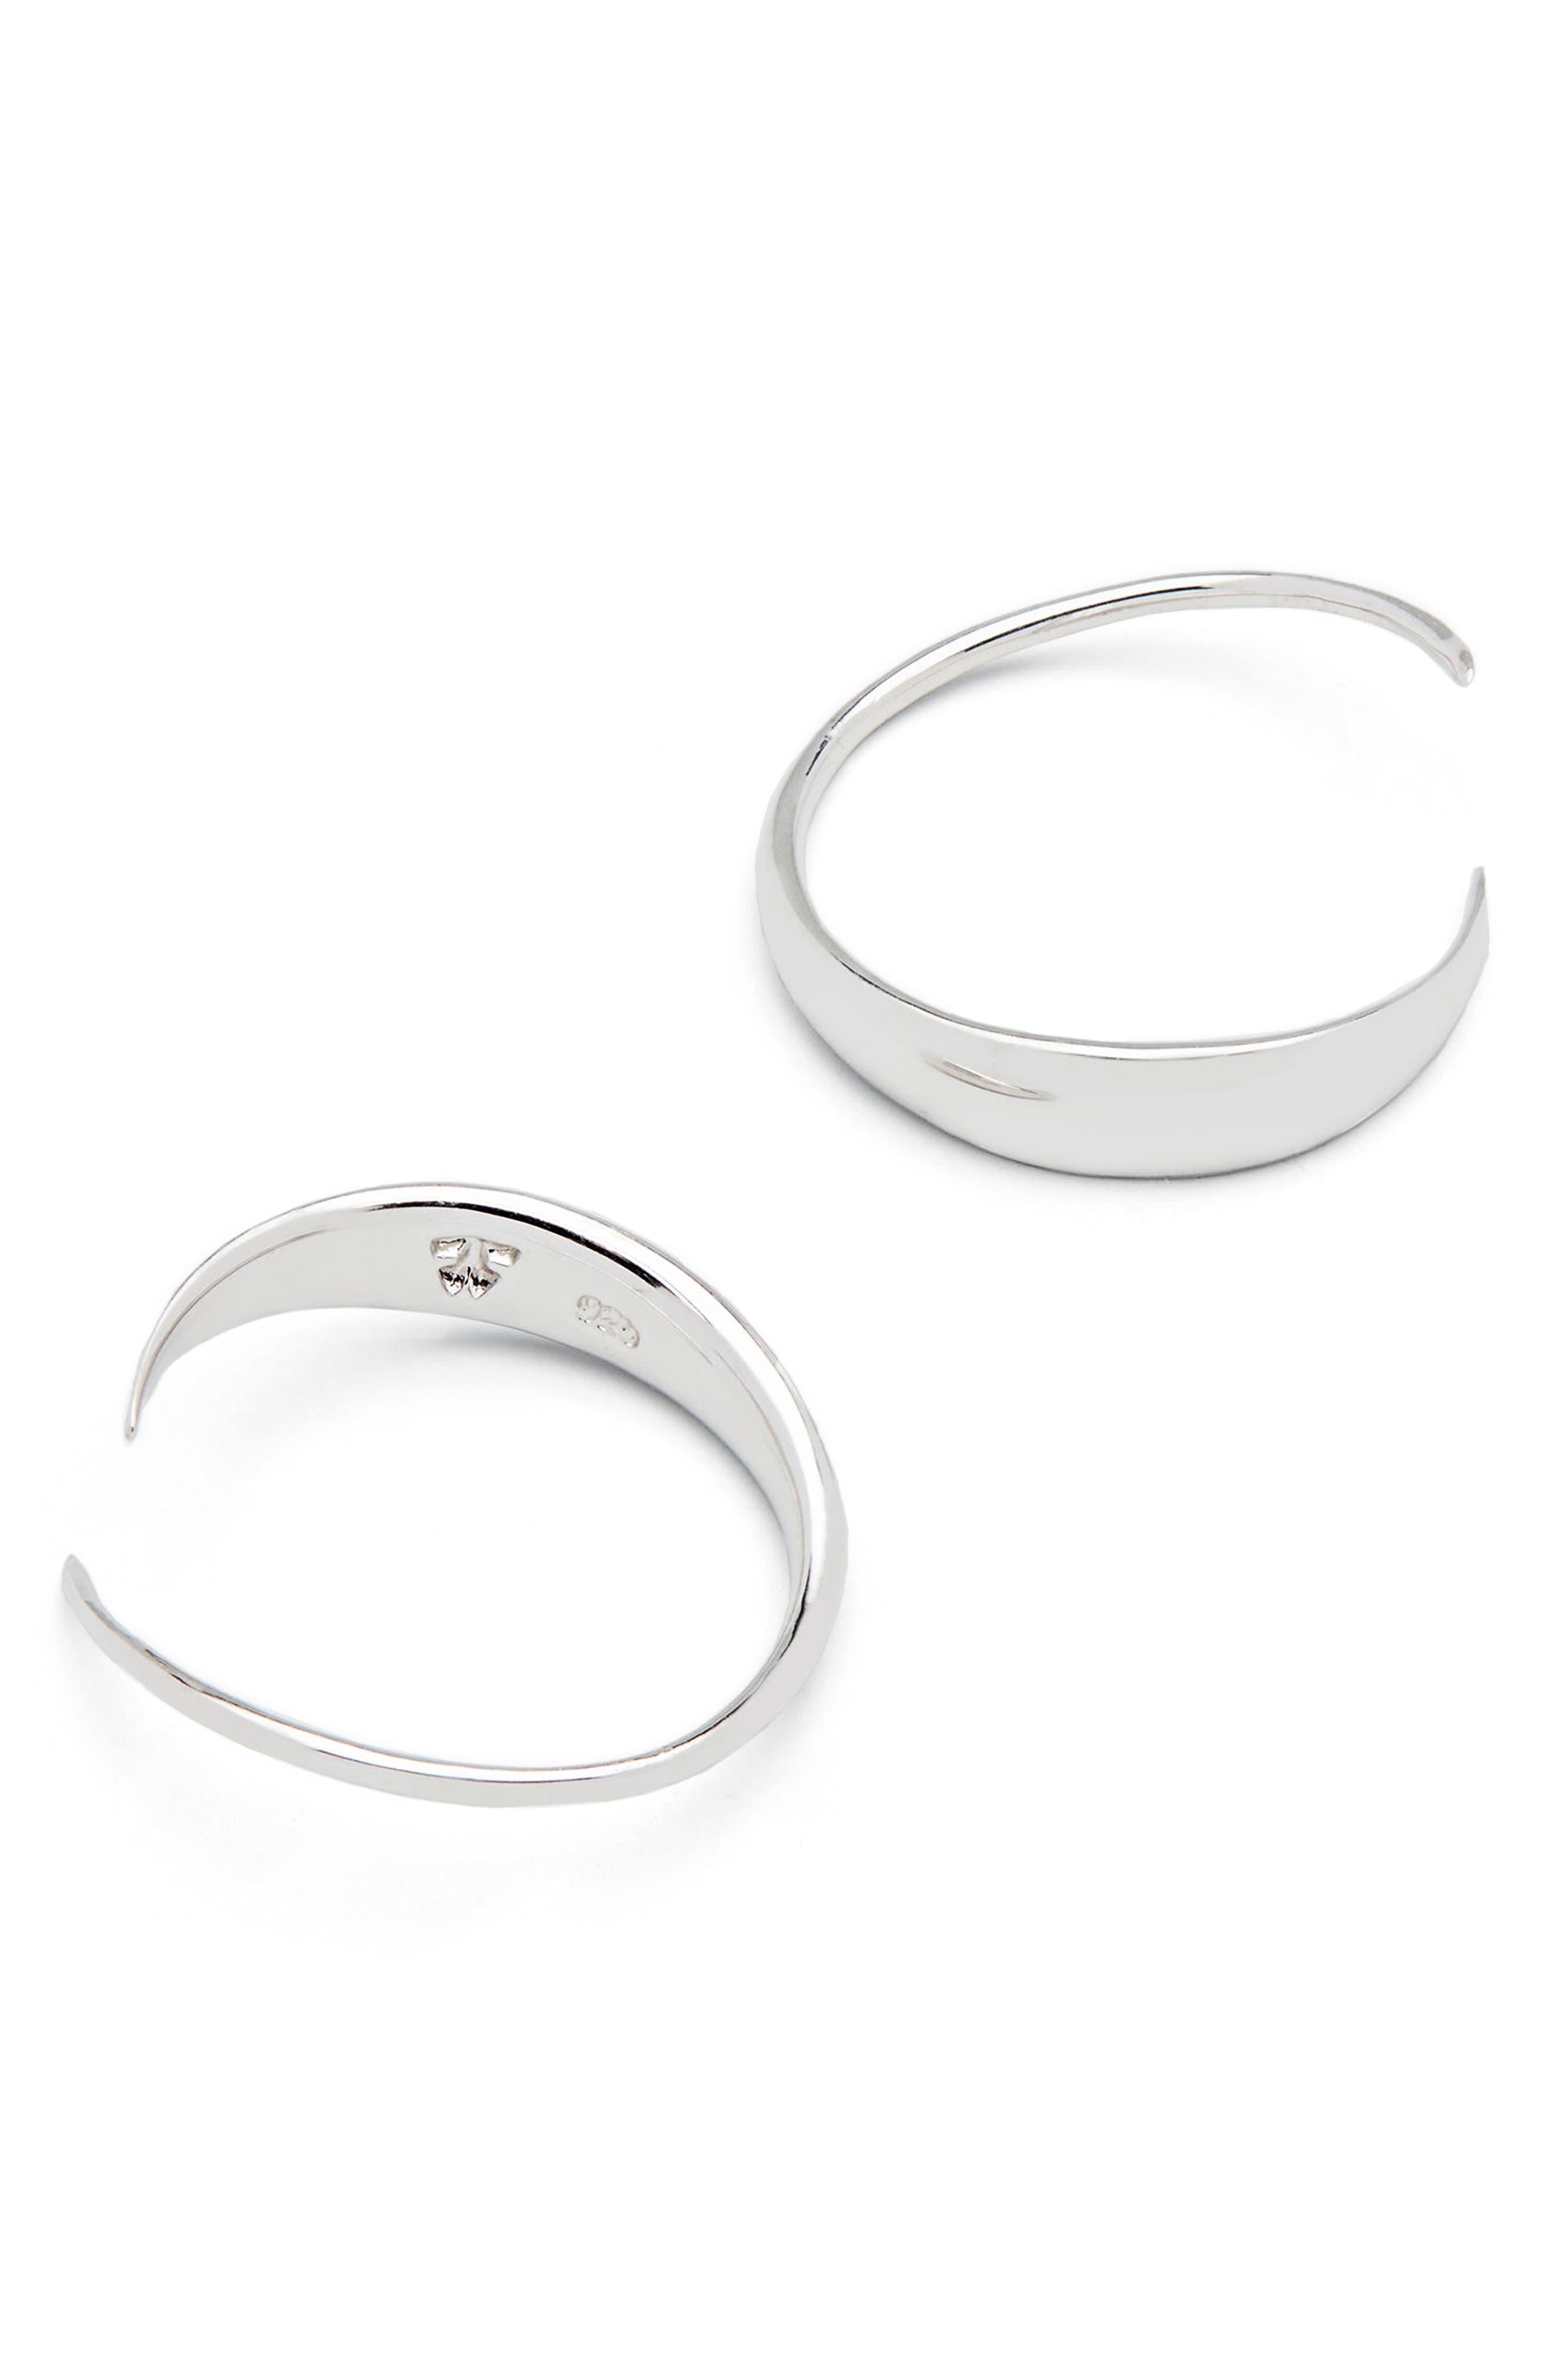 Ear Loop Earrings,                             Main thumbnail 1, color,                             925 Silver